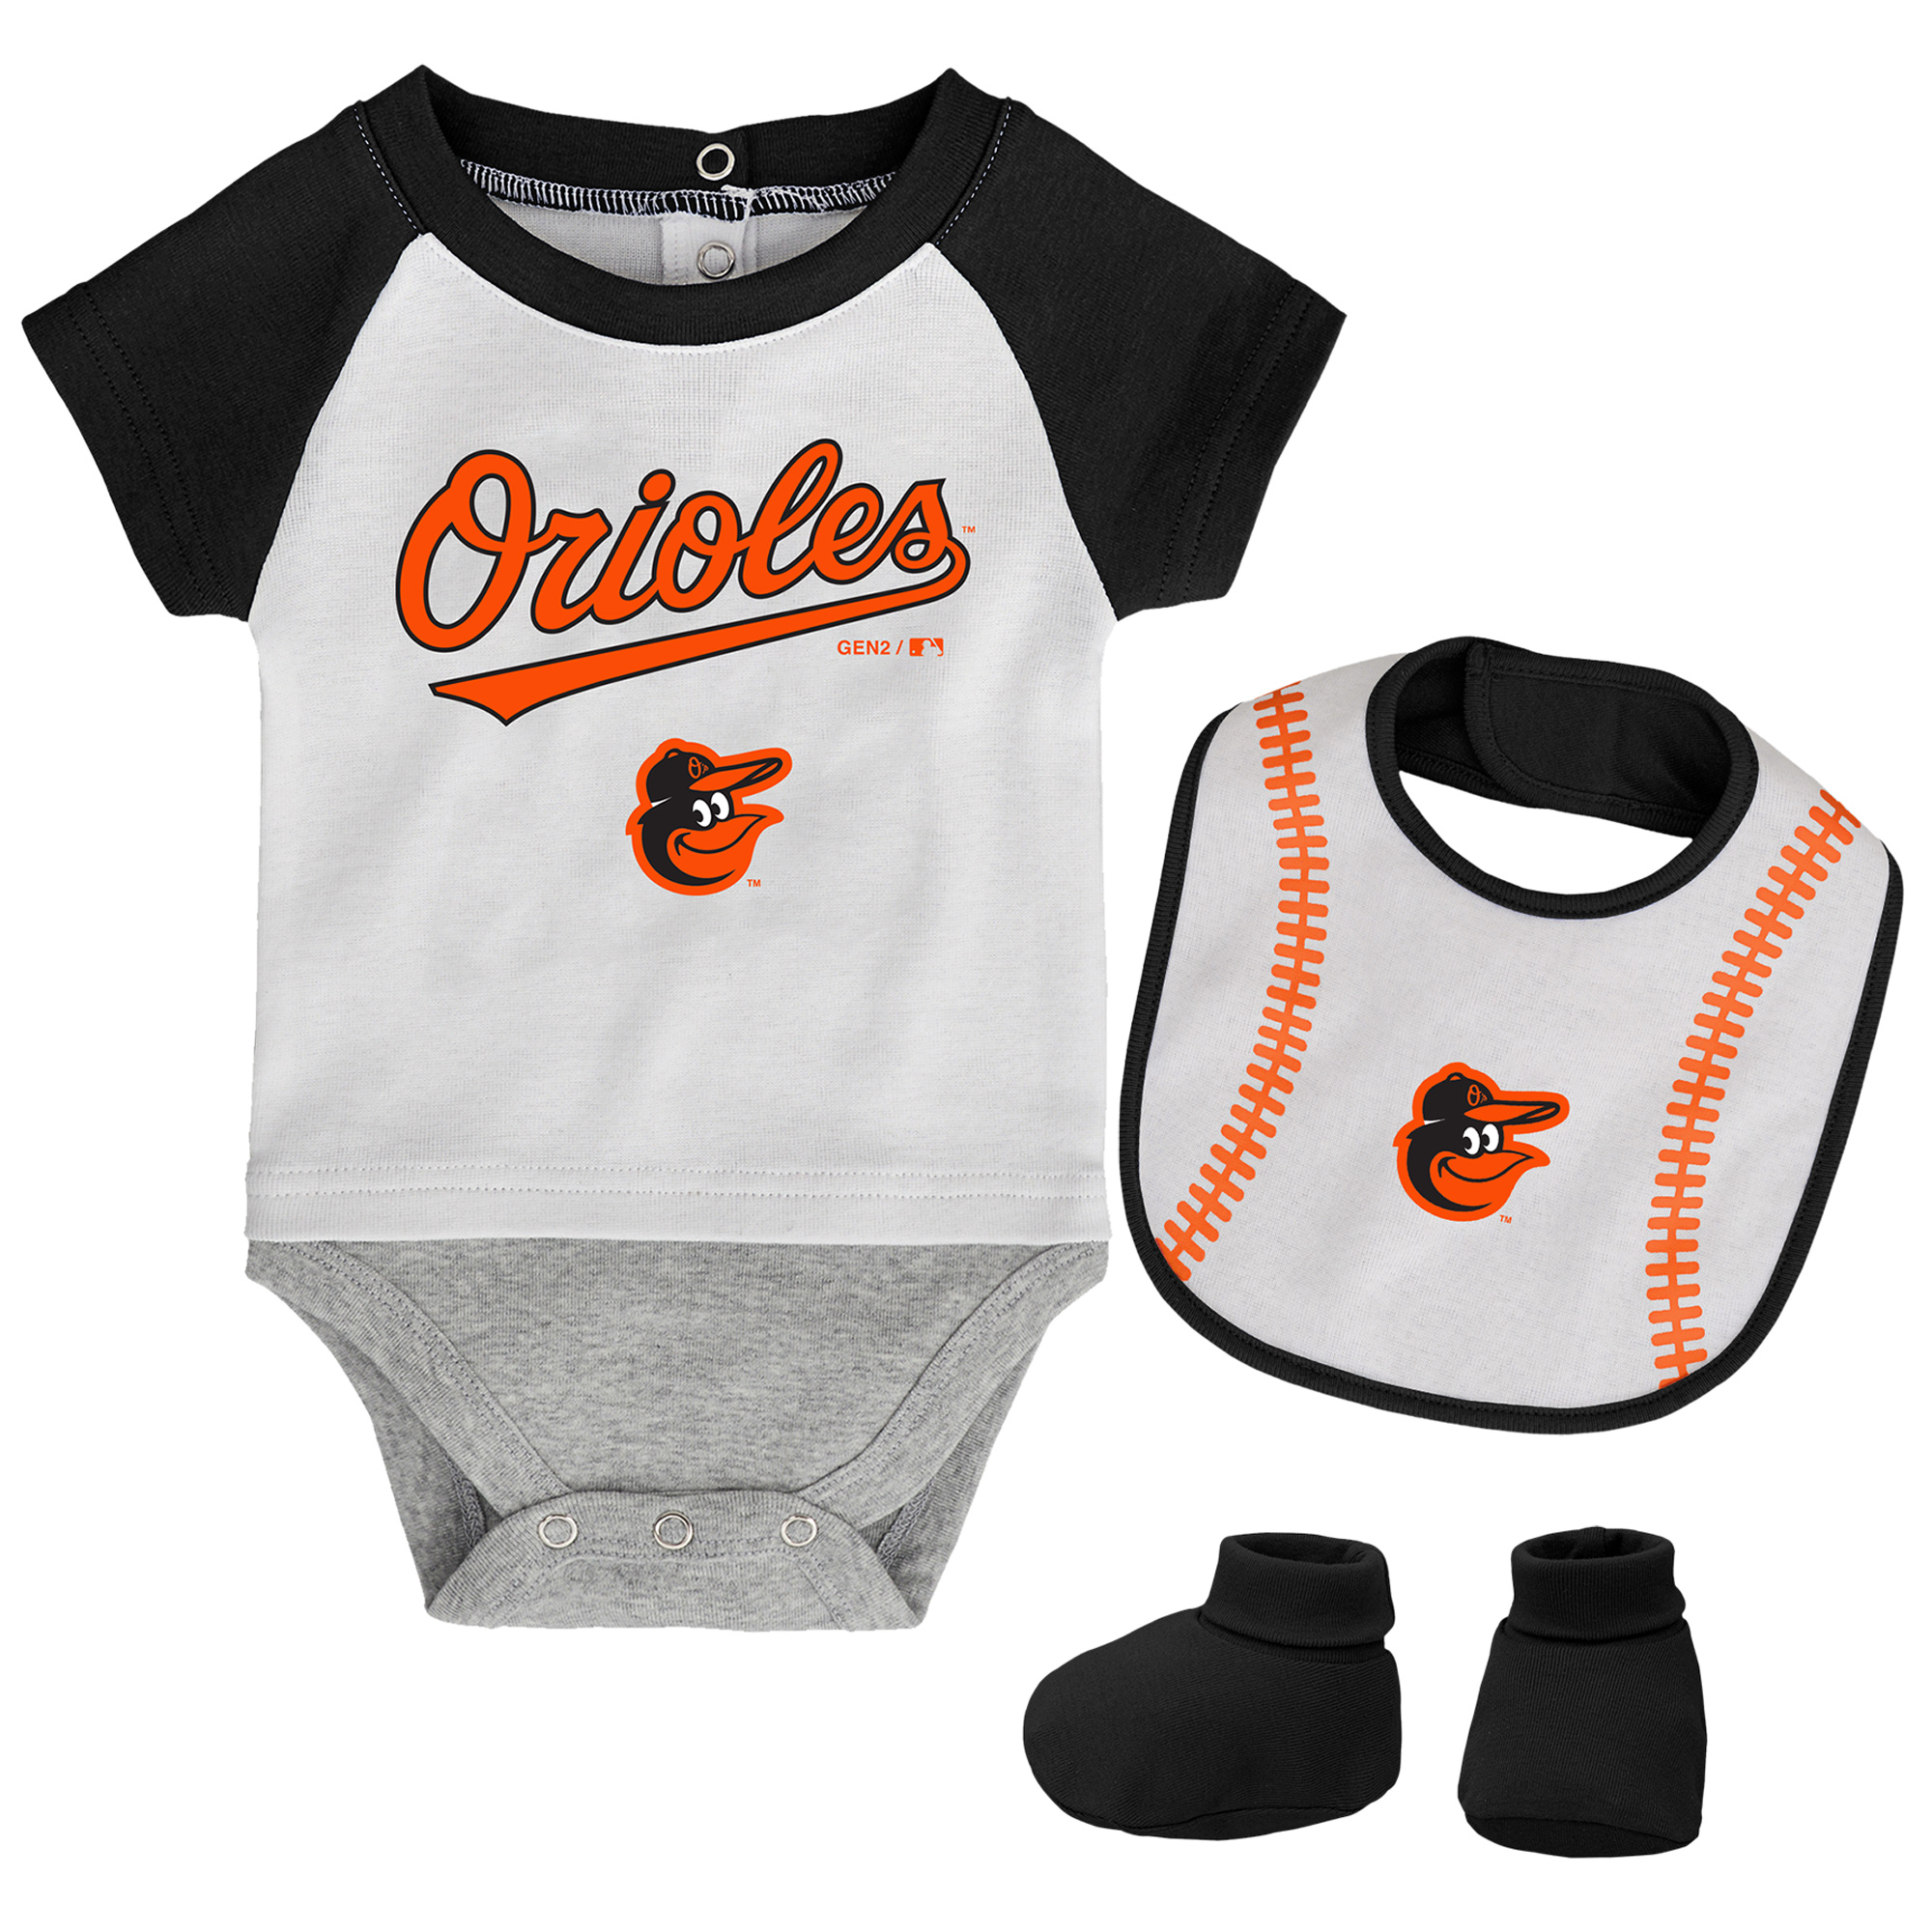 Baltimore Orioles Infant Baseball Kid Bodysuit, Bib & Booties Set - White/Black